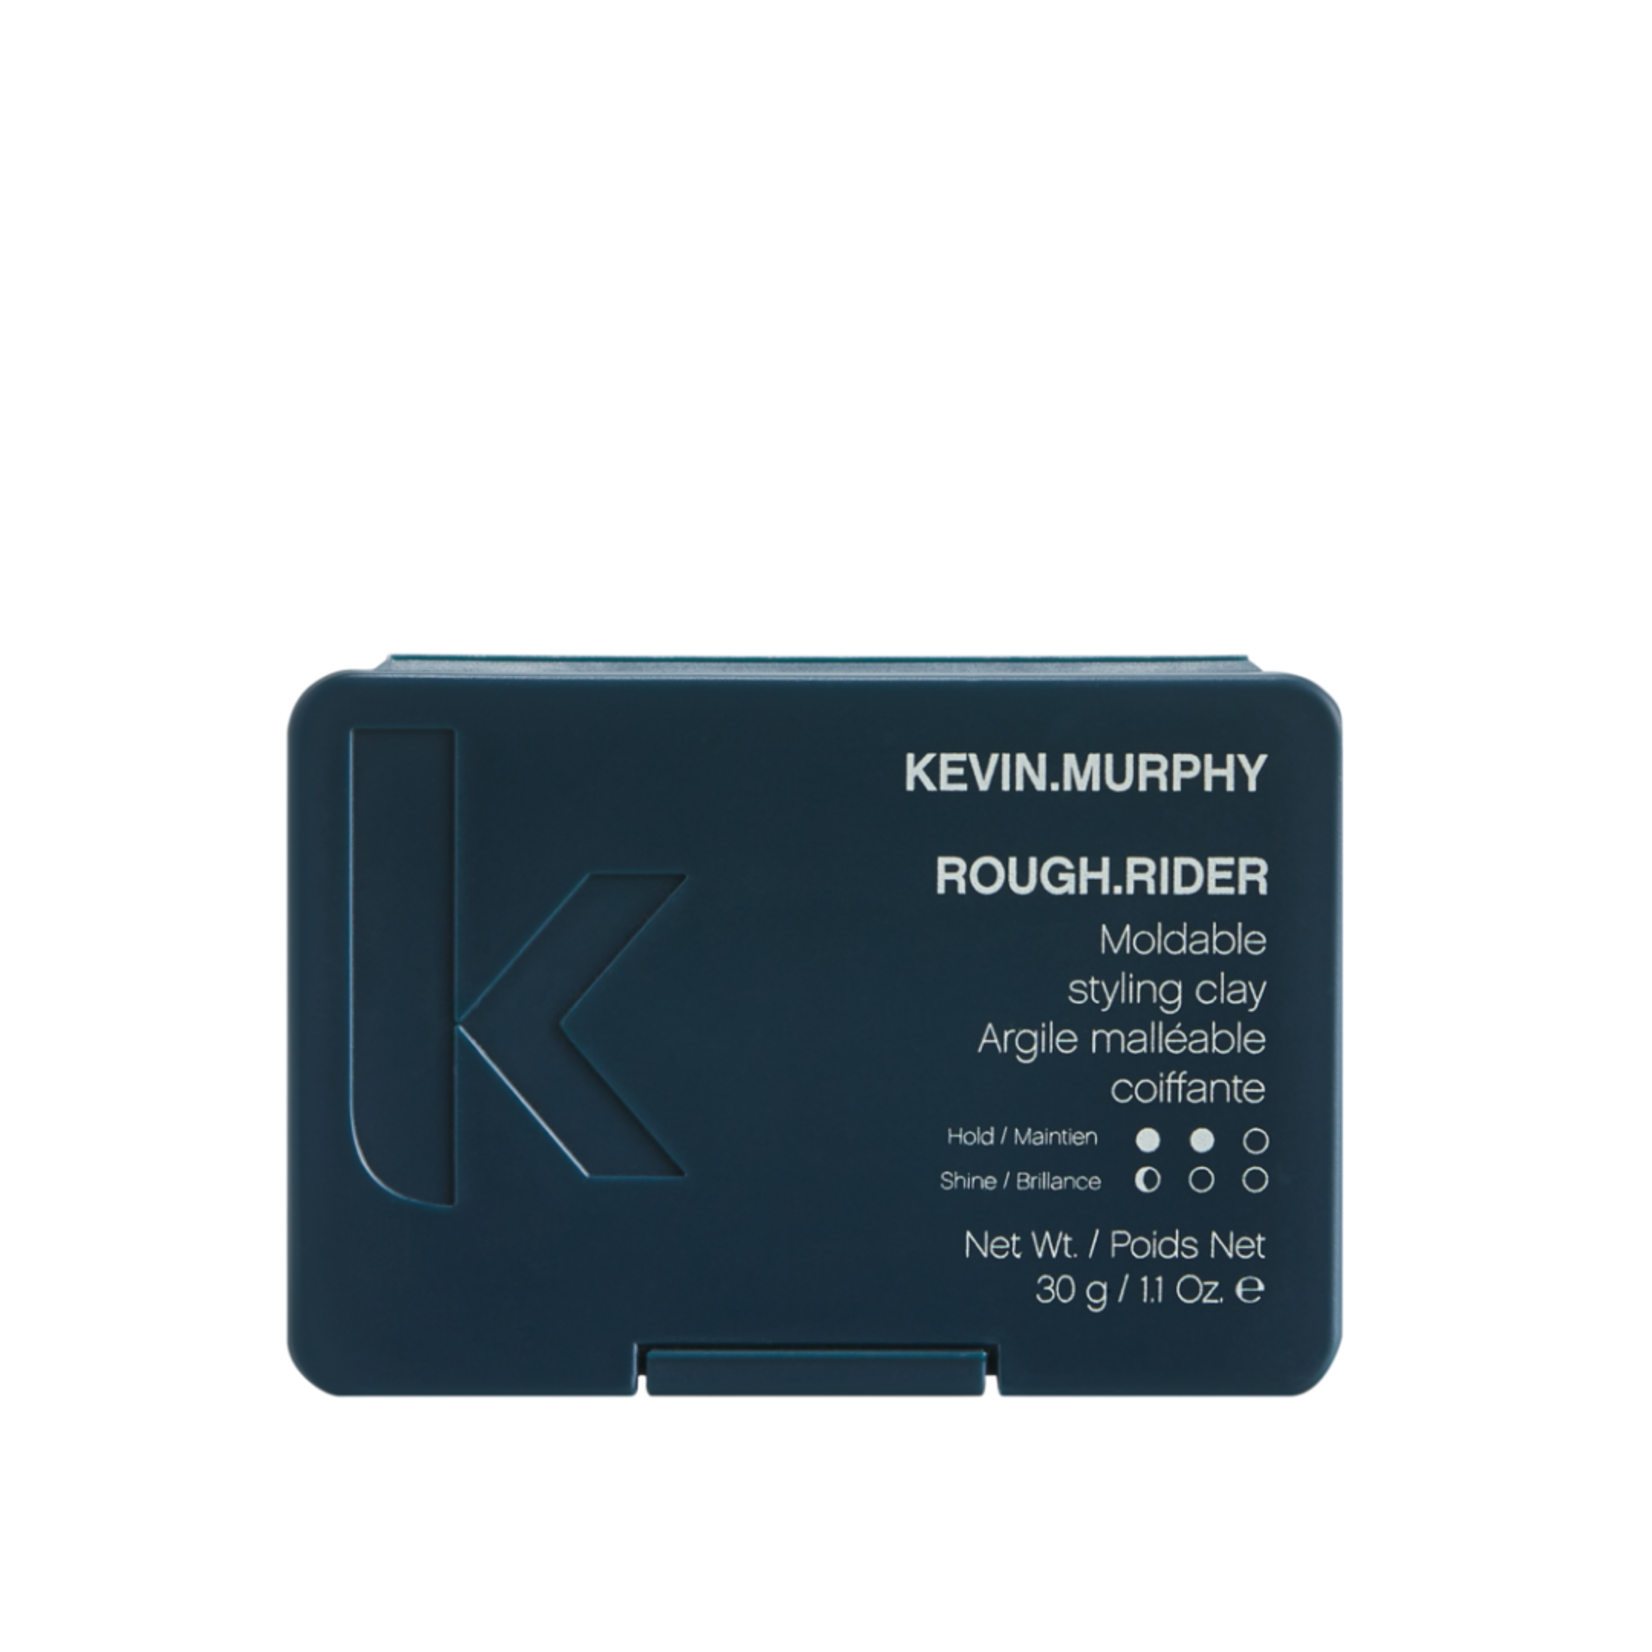 KEVIN.MURPHY KEVIN.MURPHY - ROUGH.RIDER 1.1 oz